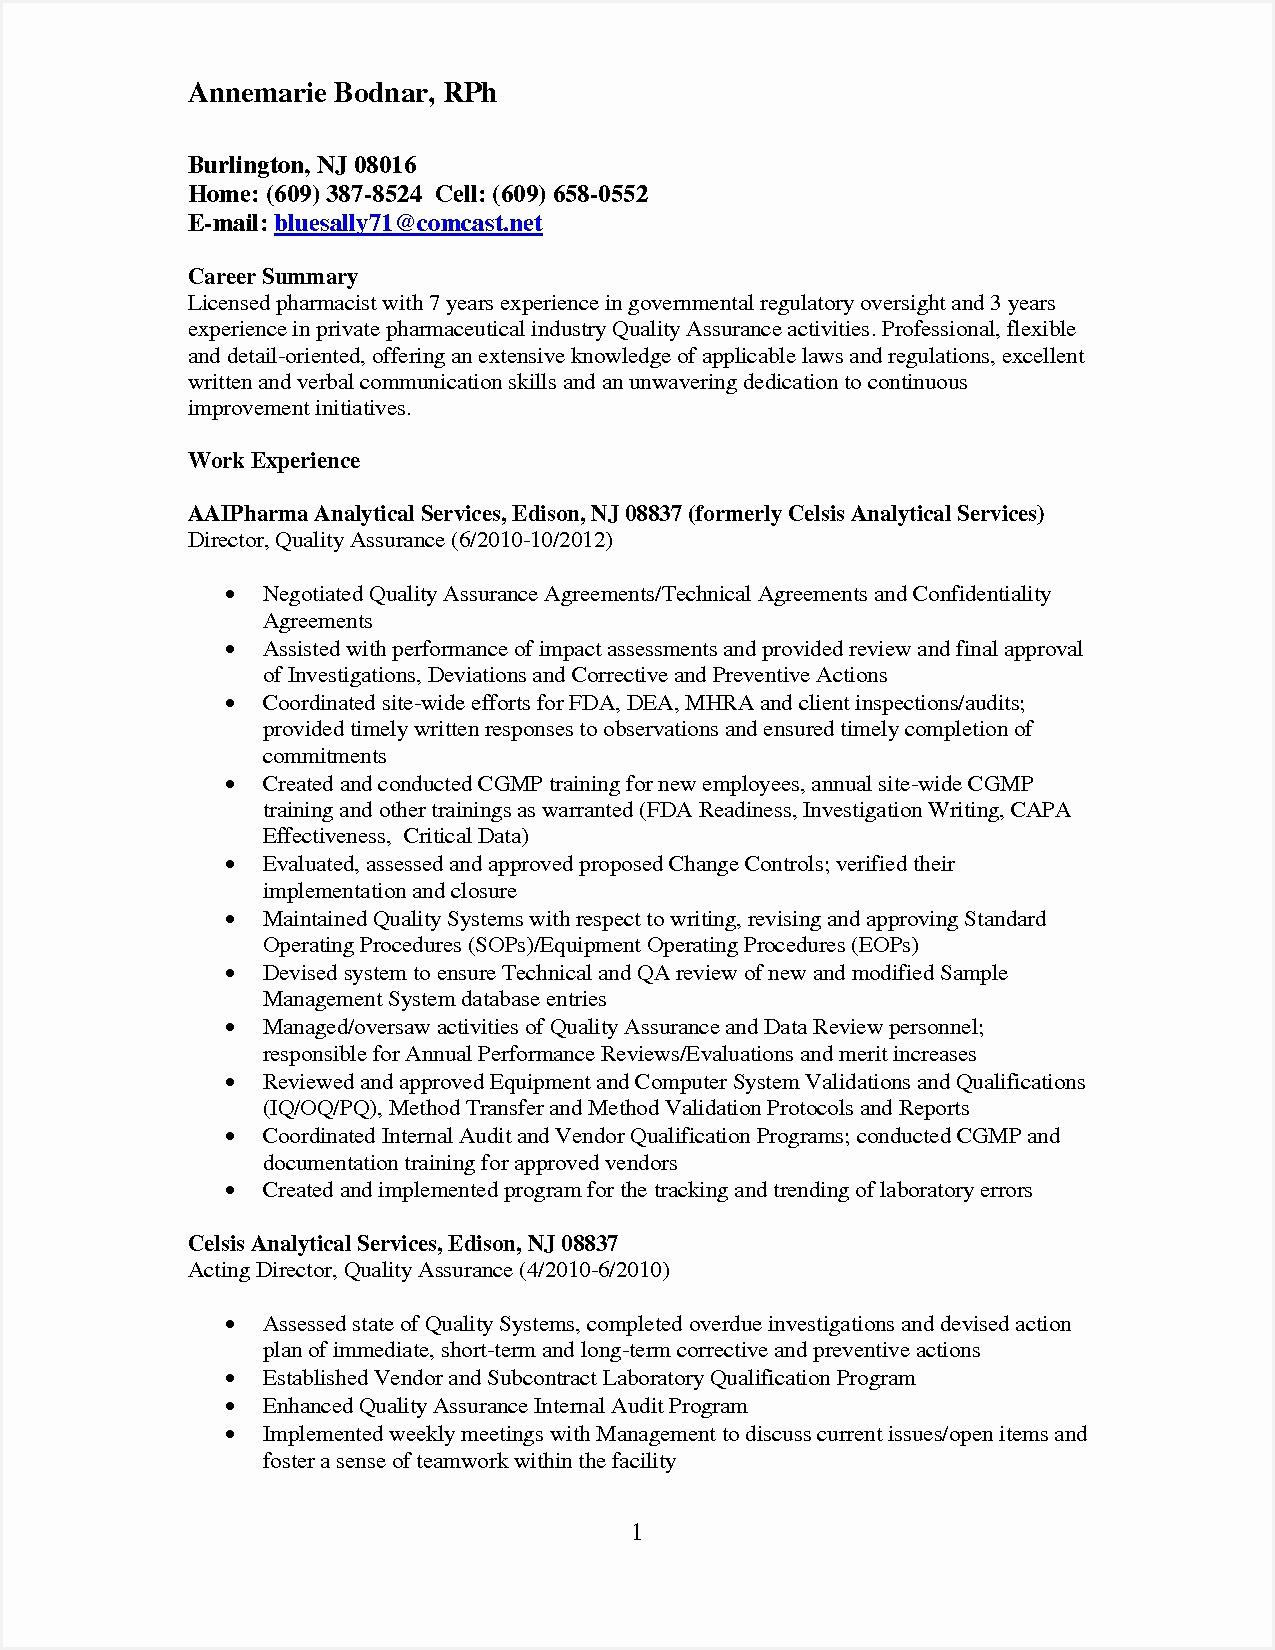 Pharmaceutical Cv Examples Elegant Tester Resume Resume format Pdf software Testing Help Pharmaceutical Cv Examples16501275